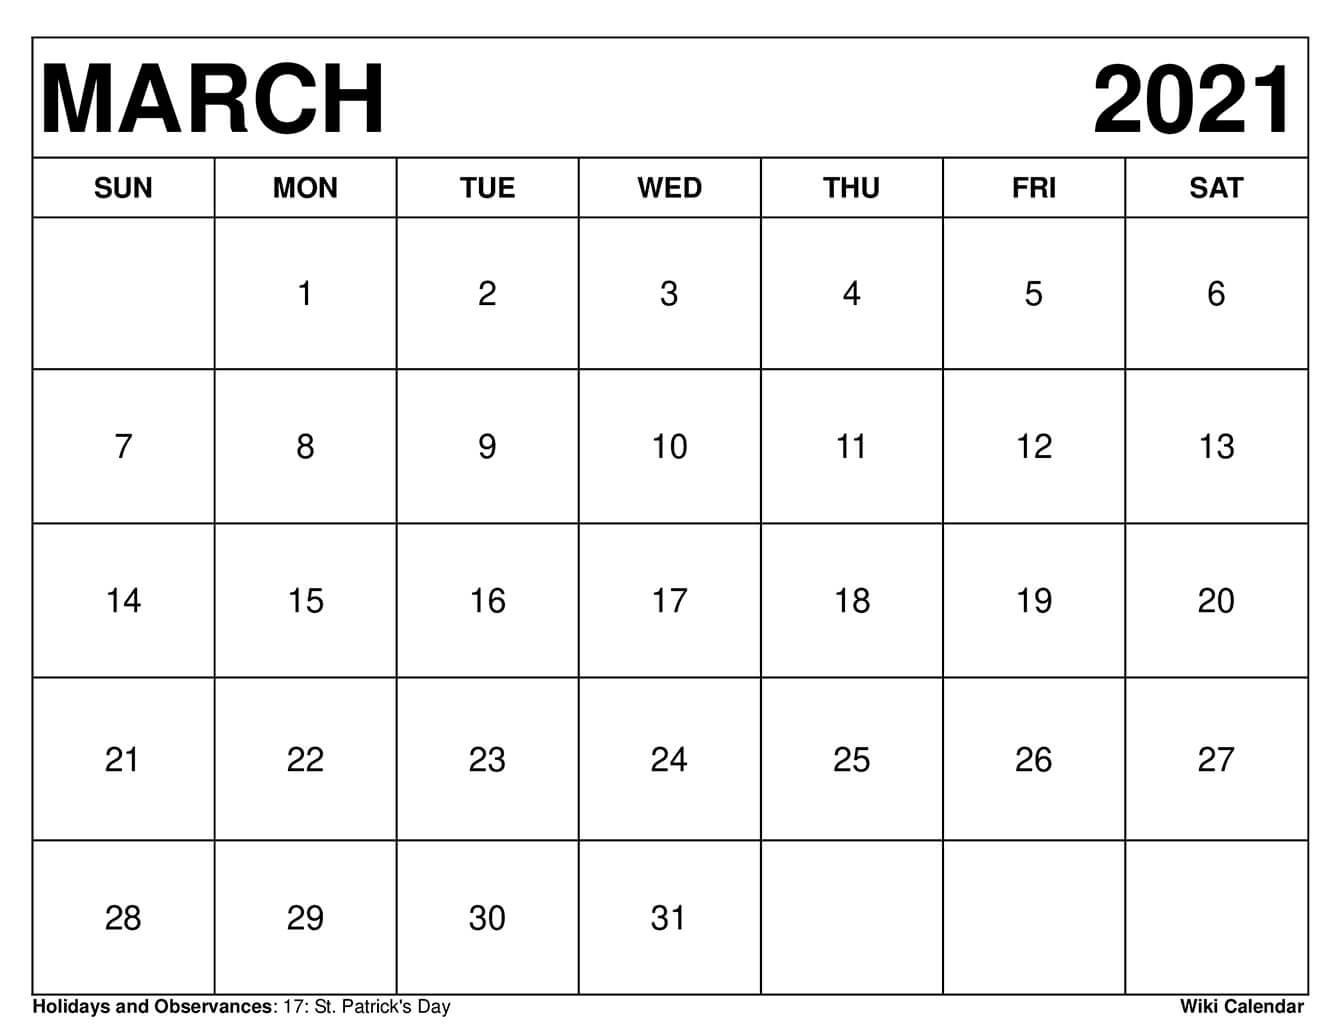 Free Printable March 2021 Calendars  Printable March 2021 Calendar Pdf